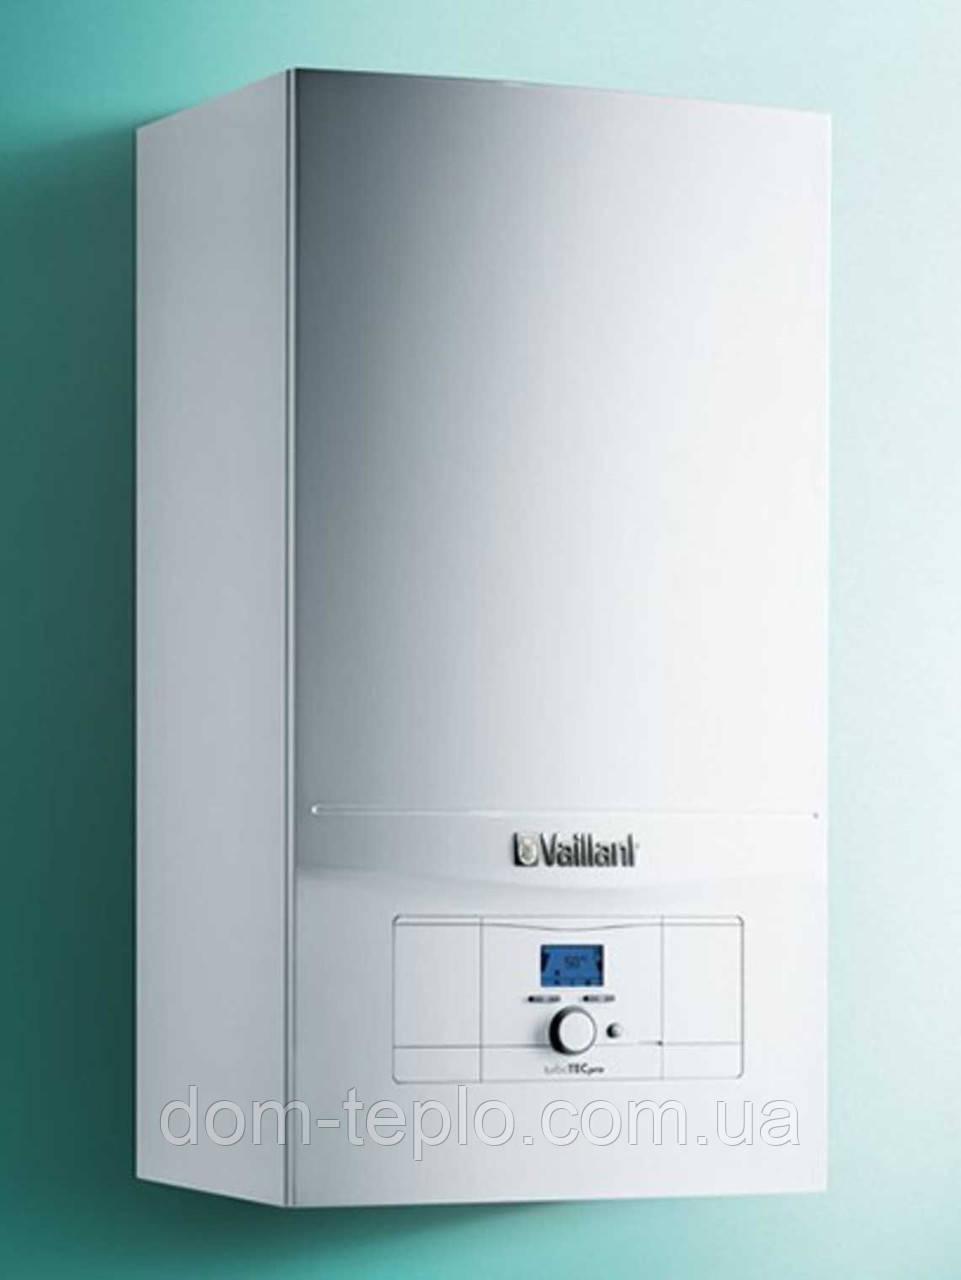 Котел газовый Vaillant turboTEC plus VU 242/5-5